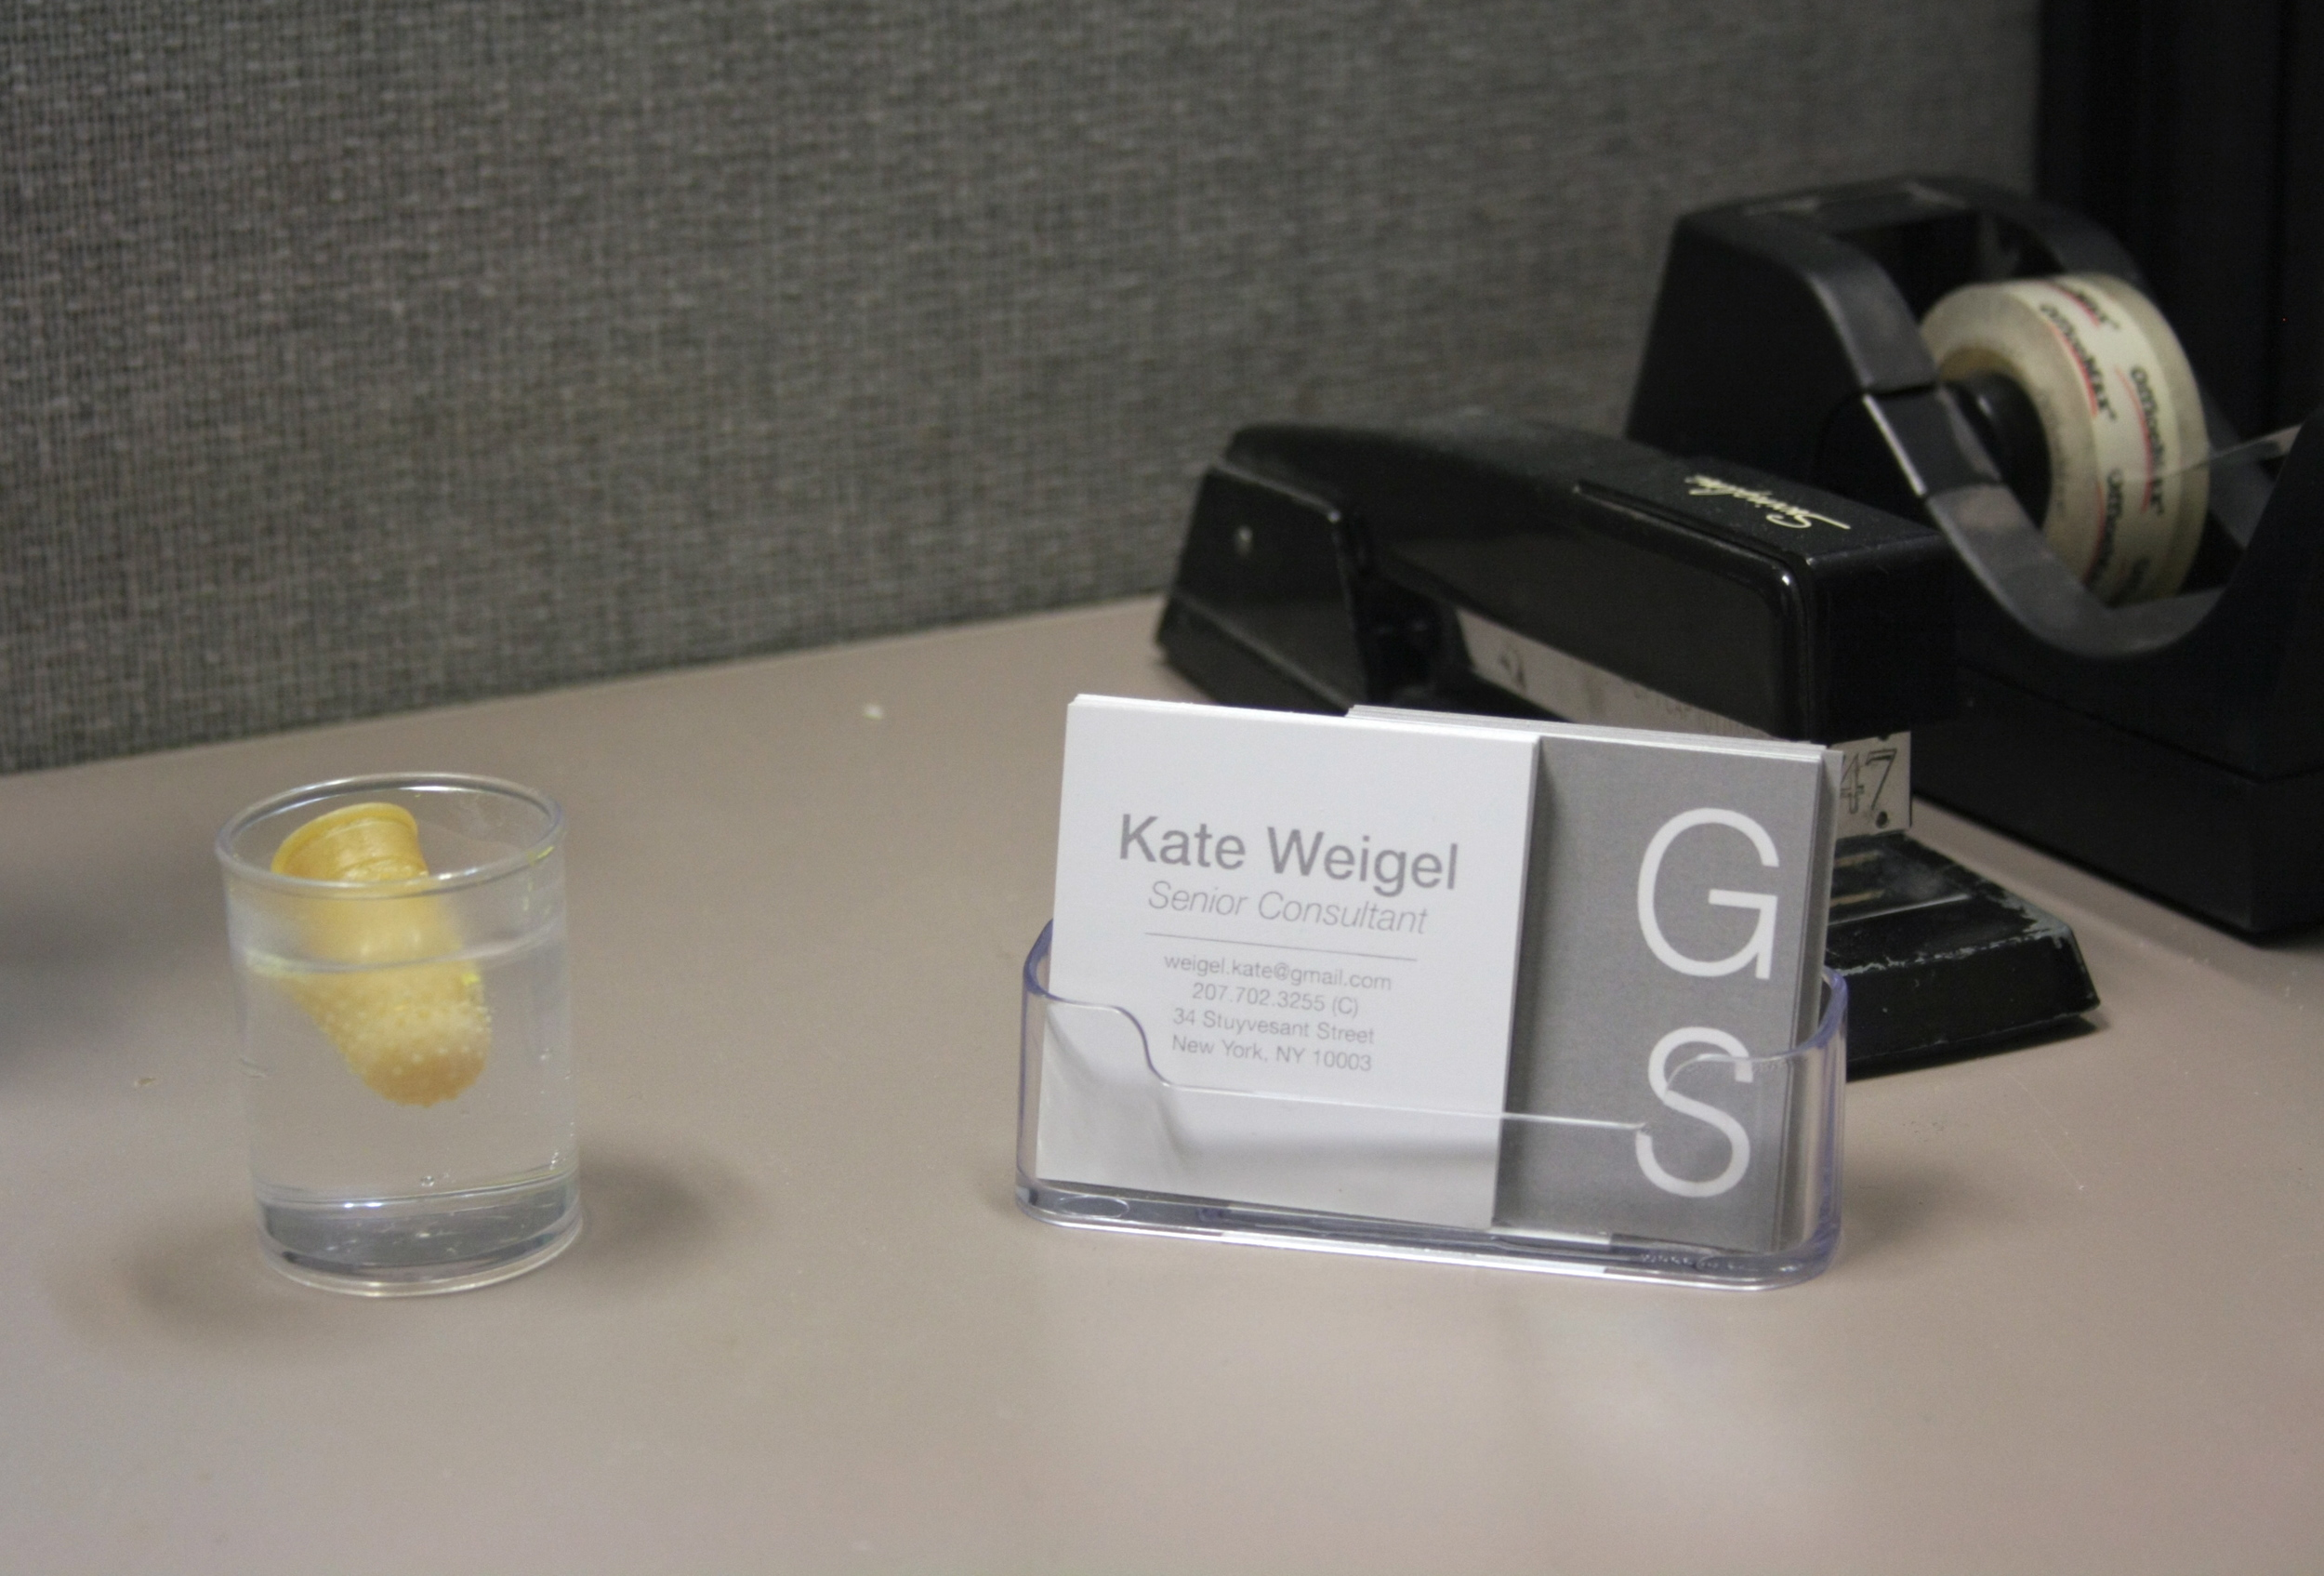 Kate Weigel Office Space